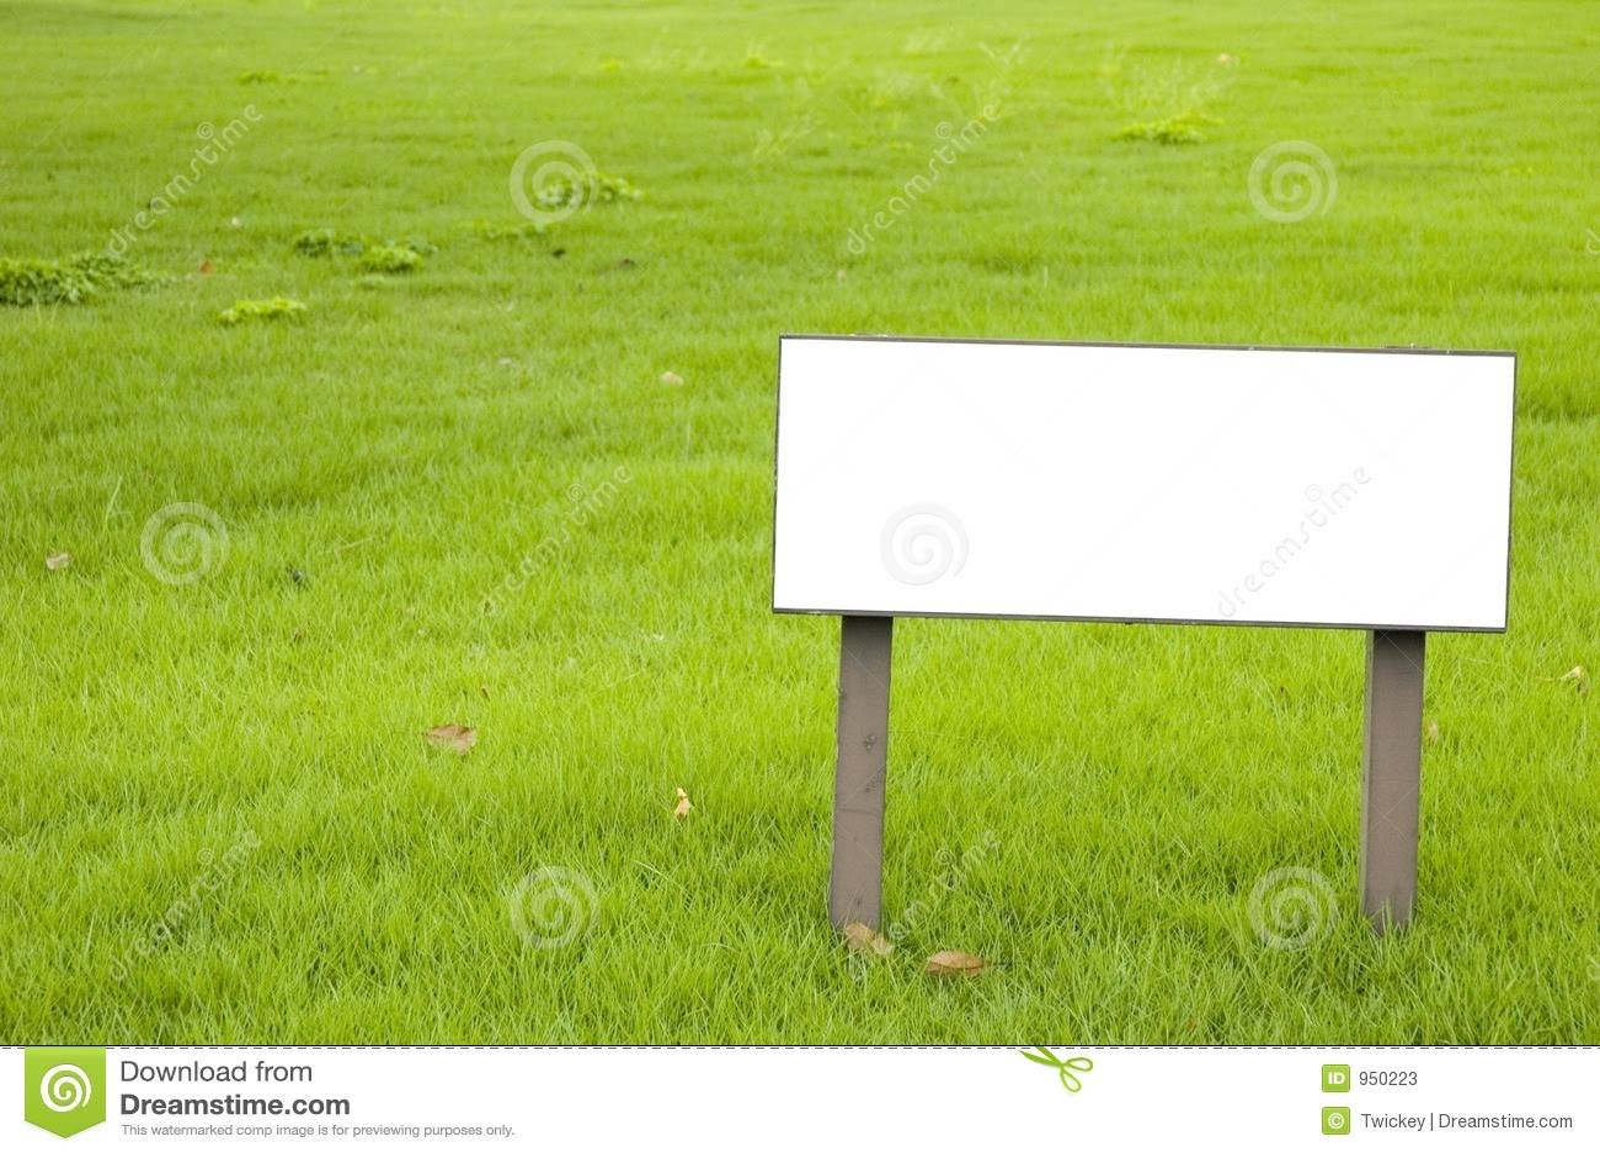 Blank Sign Stock Photos - Image: 950223